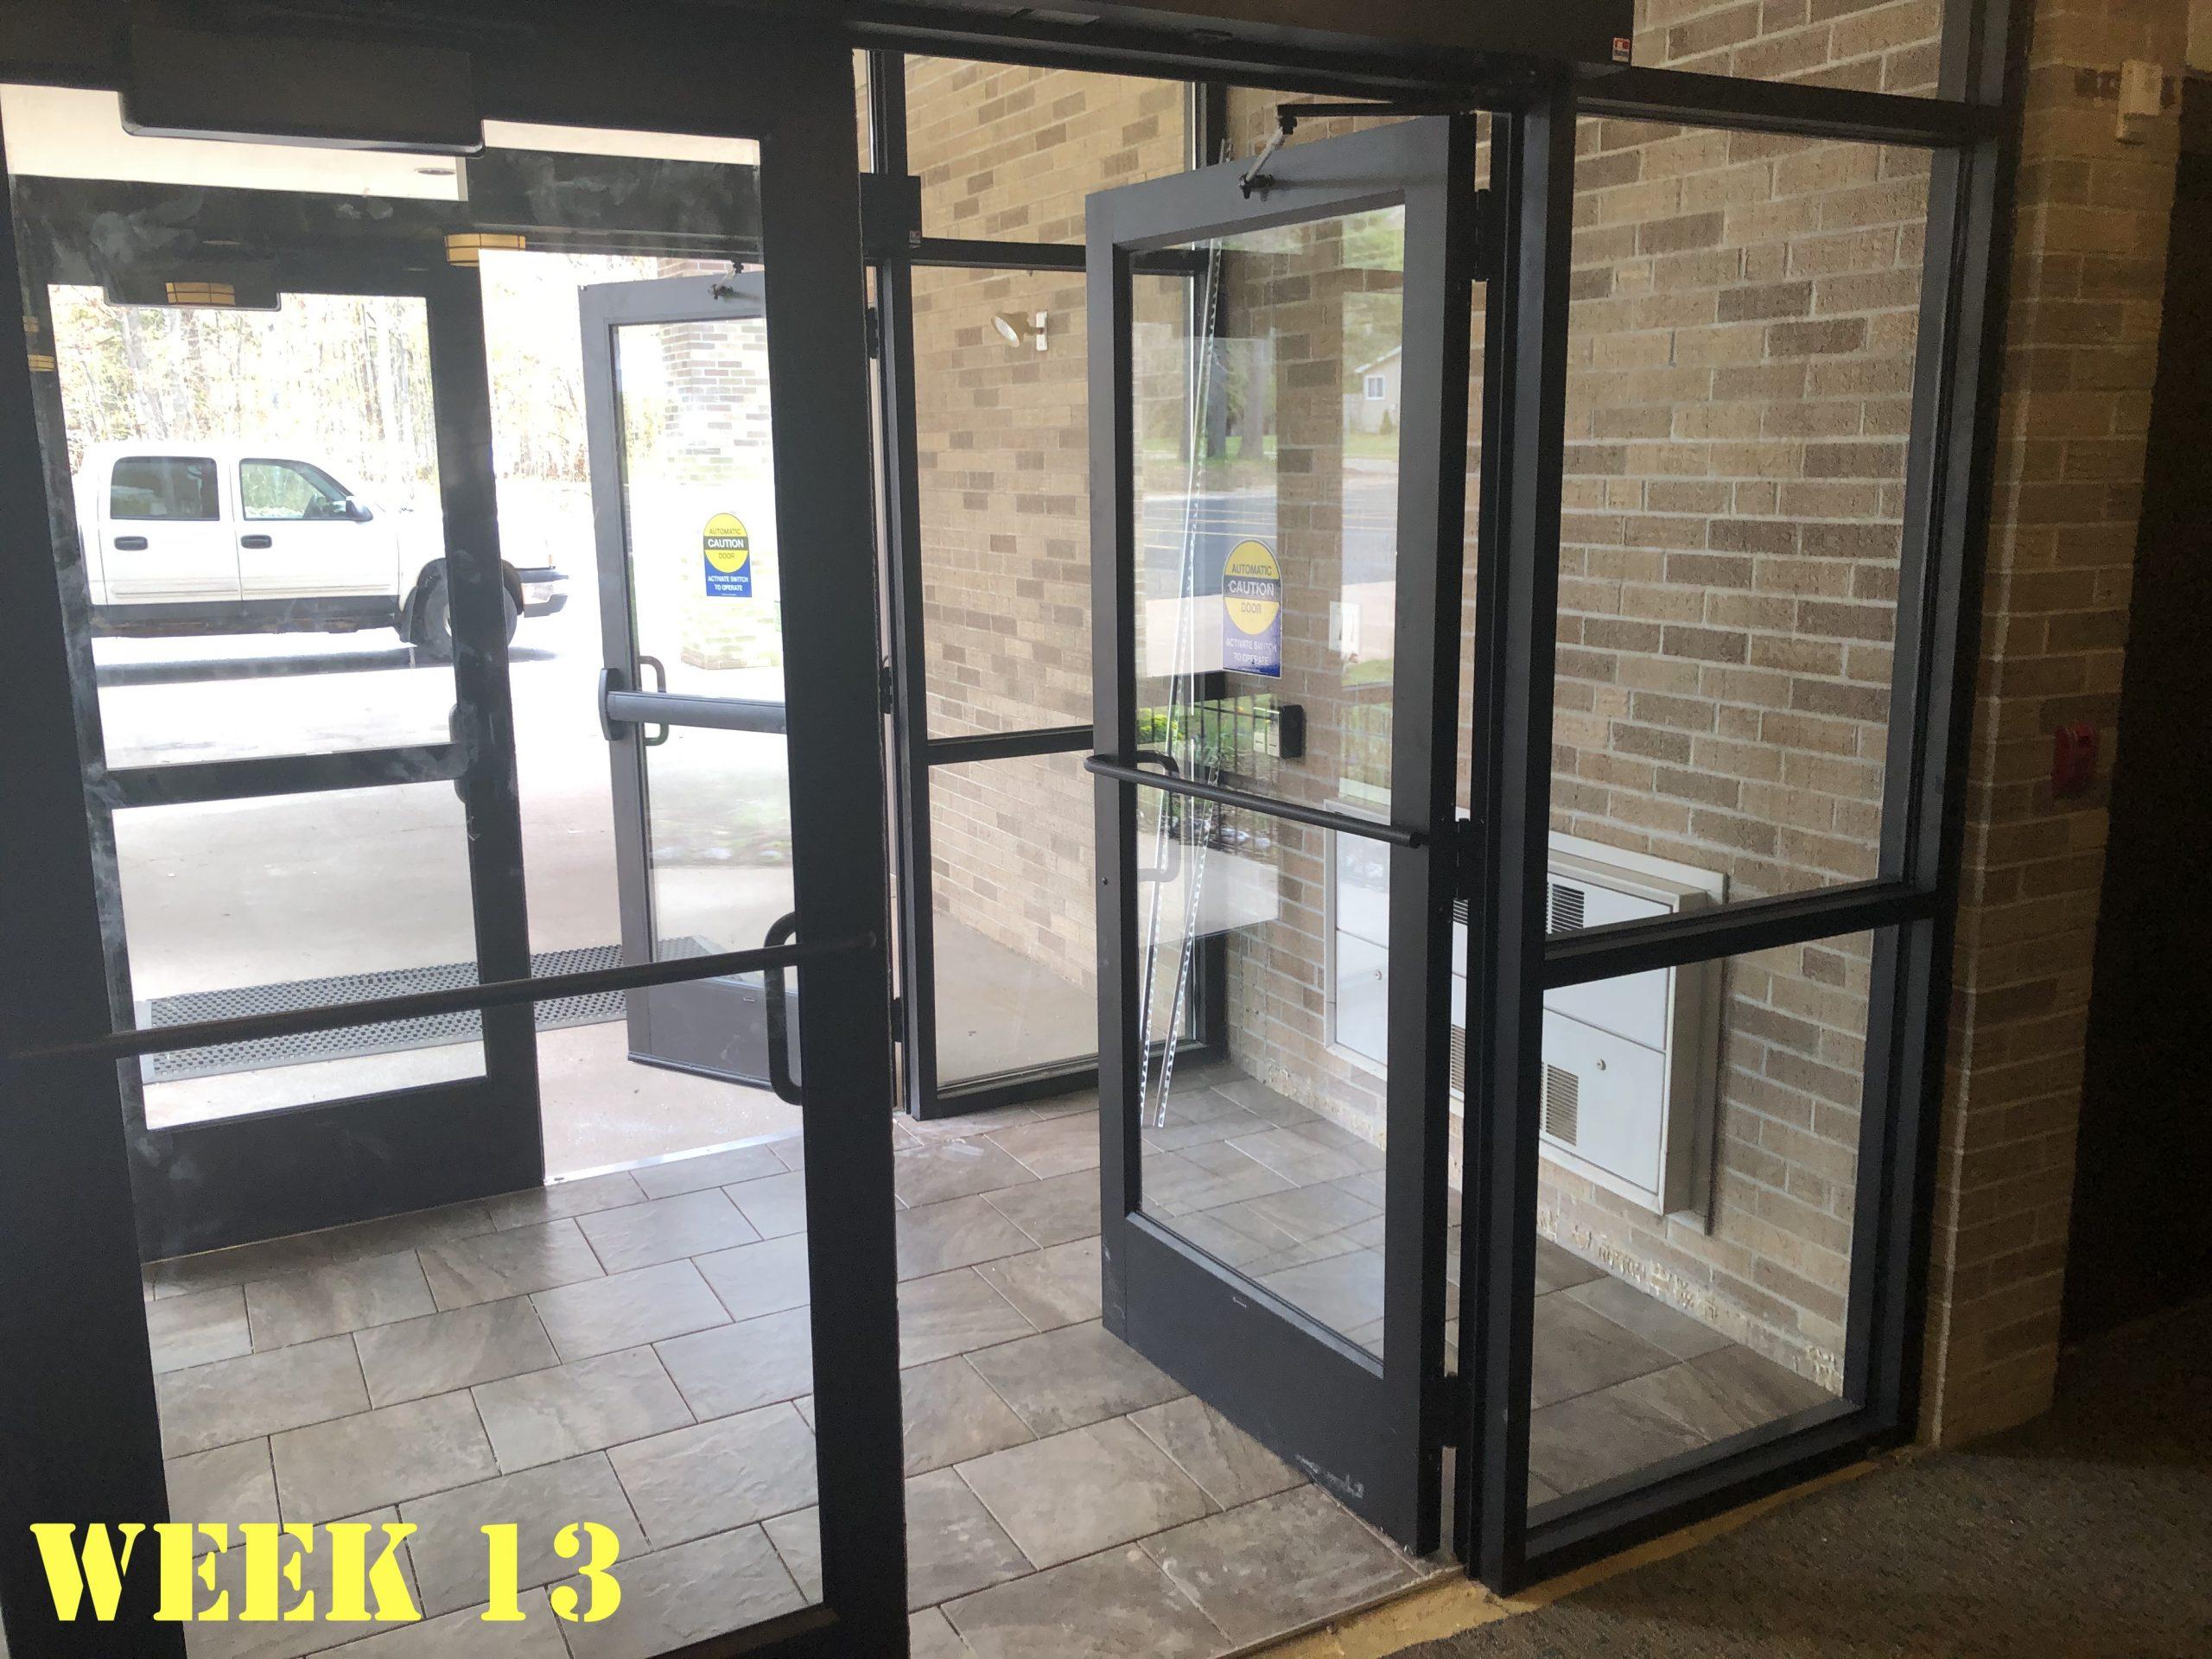 Week 13 Doors